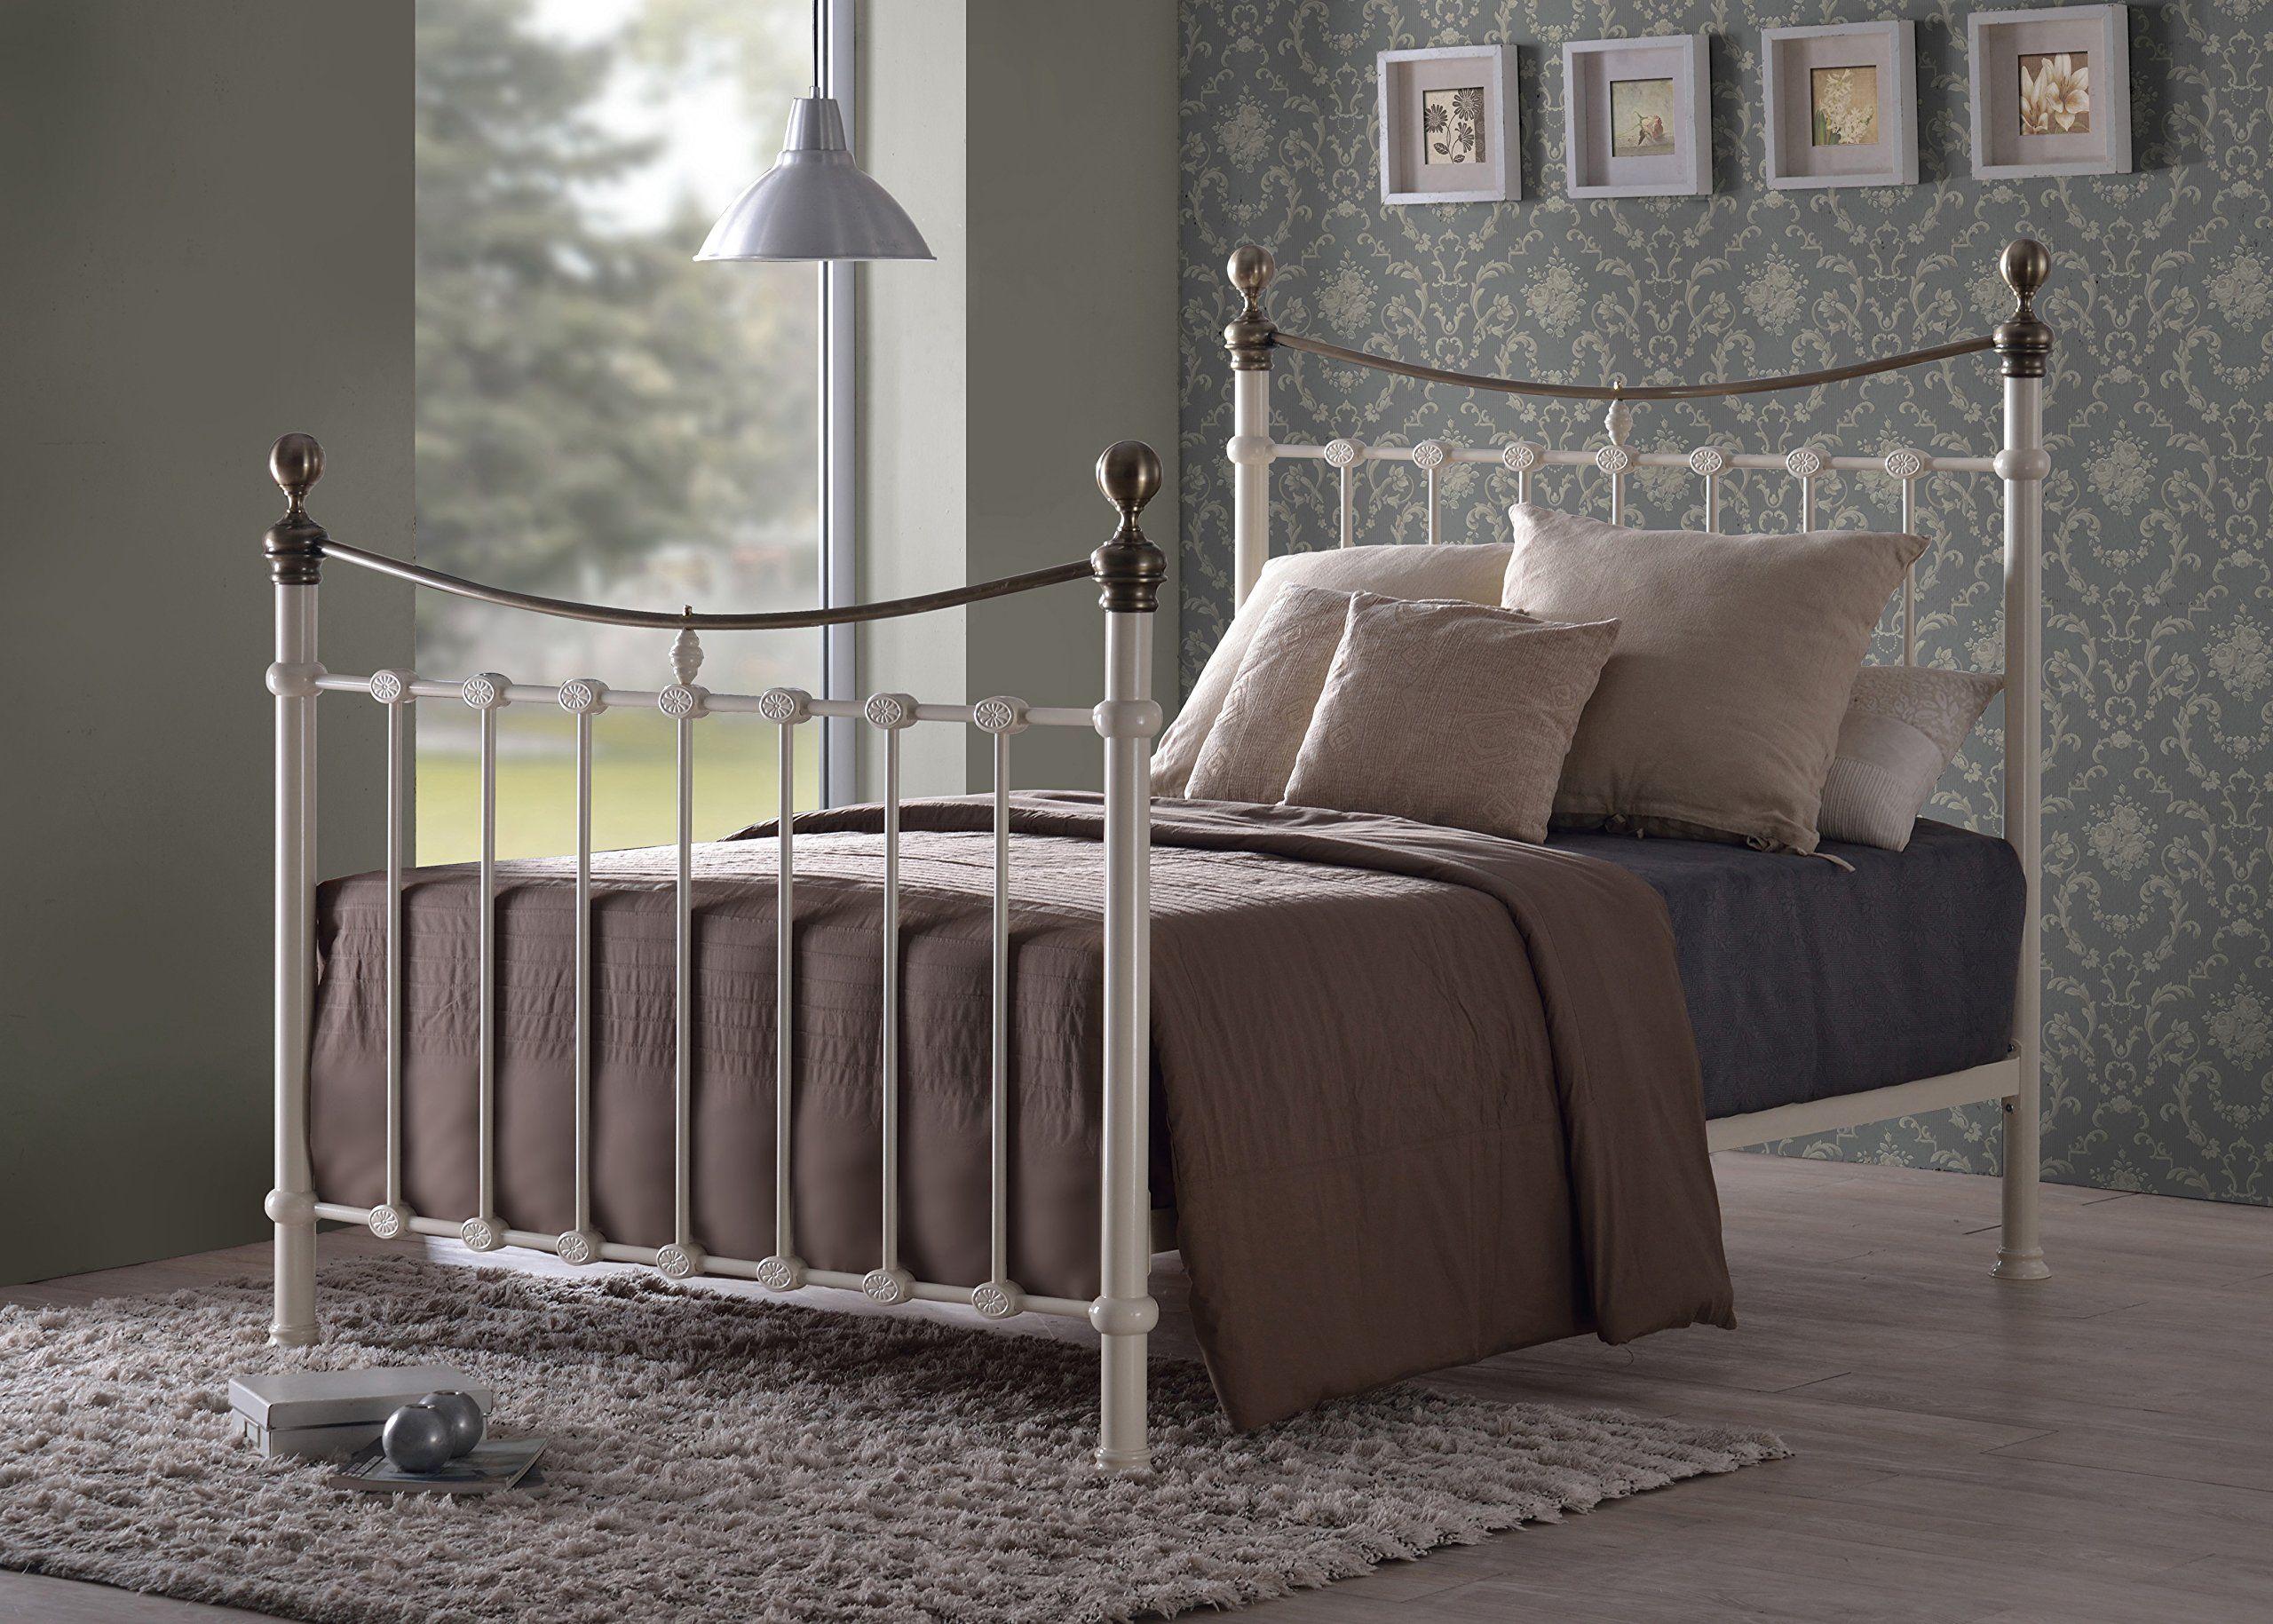 Elizabeth 5ft king metal bed frame in cream with brushed